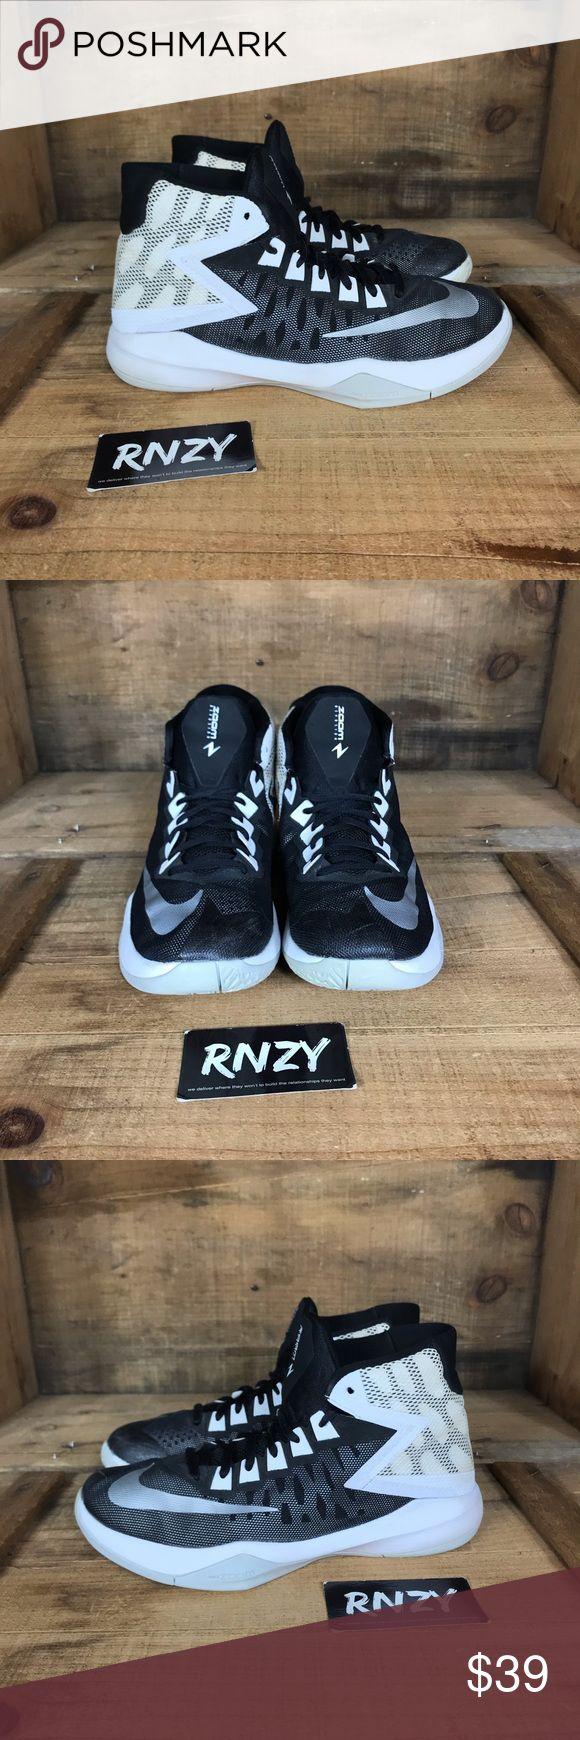 Nike Zoom Devosion Mid Gently used. Normal wear. Smoke free. No box. We always c…